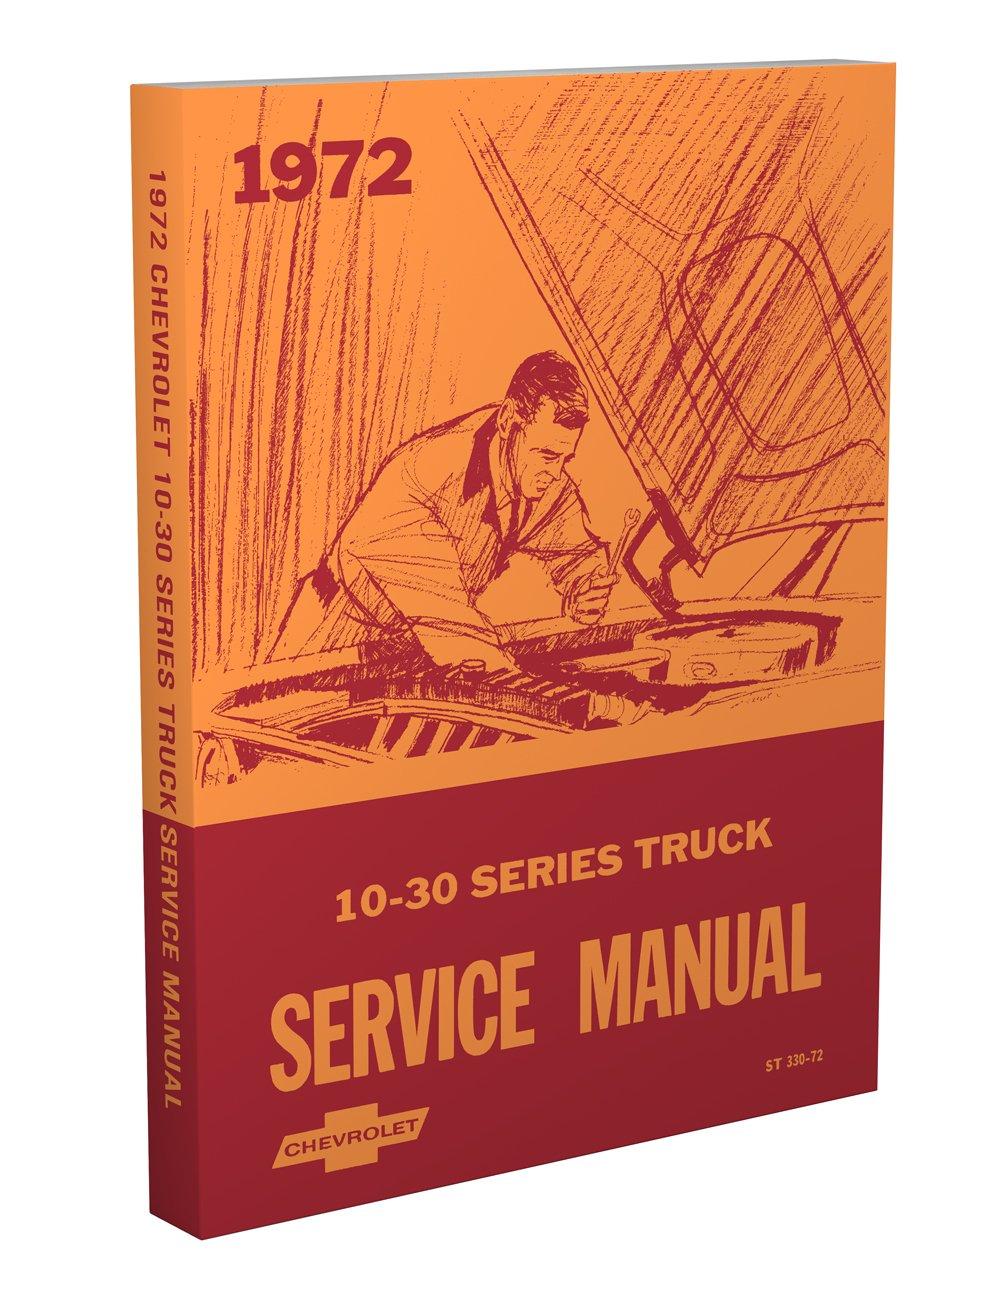 1972 Chevrolet Truck Repair Shop Manual Reprint Chevy Pickup Colored Wiring Diagram 72 Free Suburban Blazer Faxon Auto Literature Books